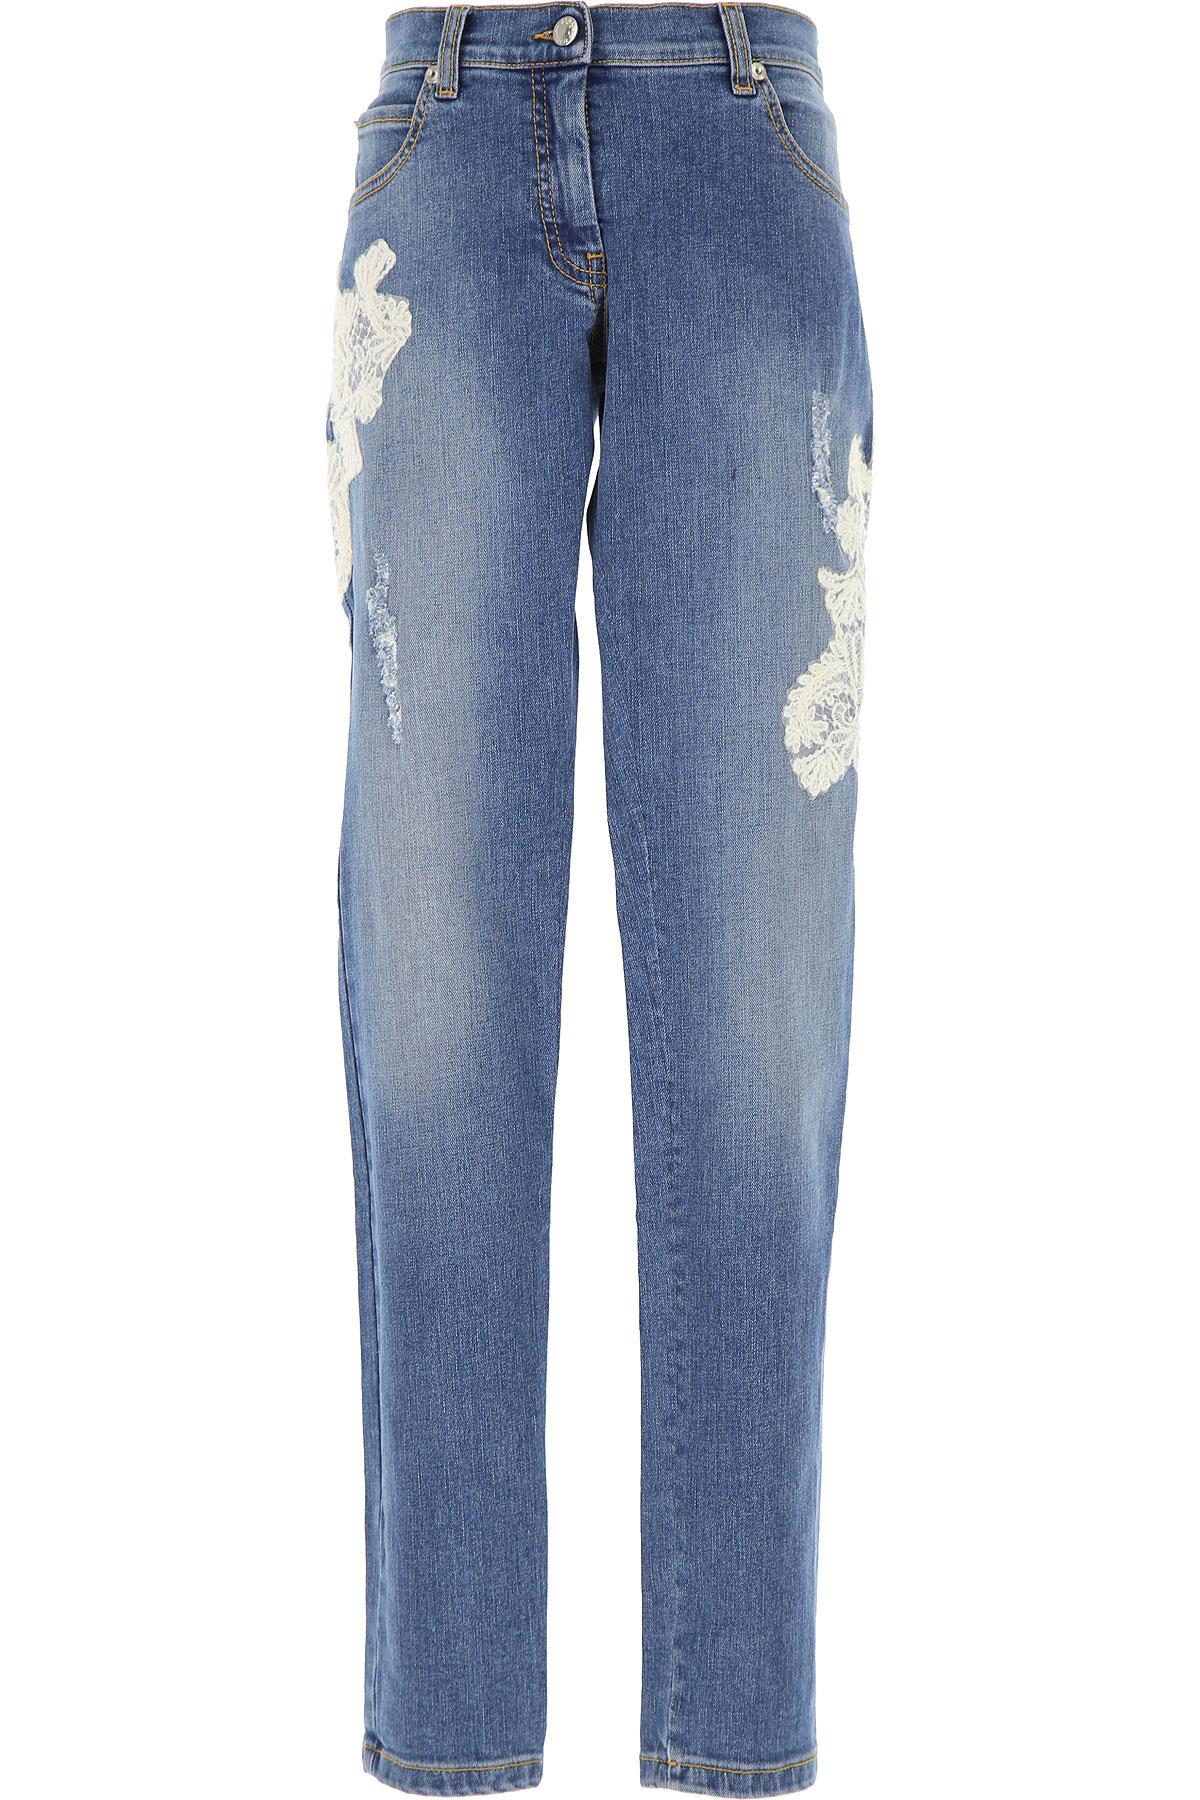 Ermanno Scervino Kids Jeans for Girls On Sale, Denim Blue, Cotton, 2019, 10Y 12Y 14Y 8Y